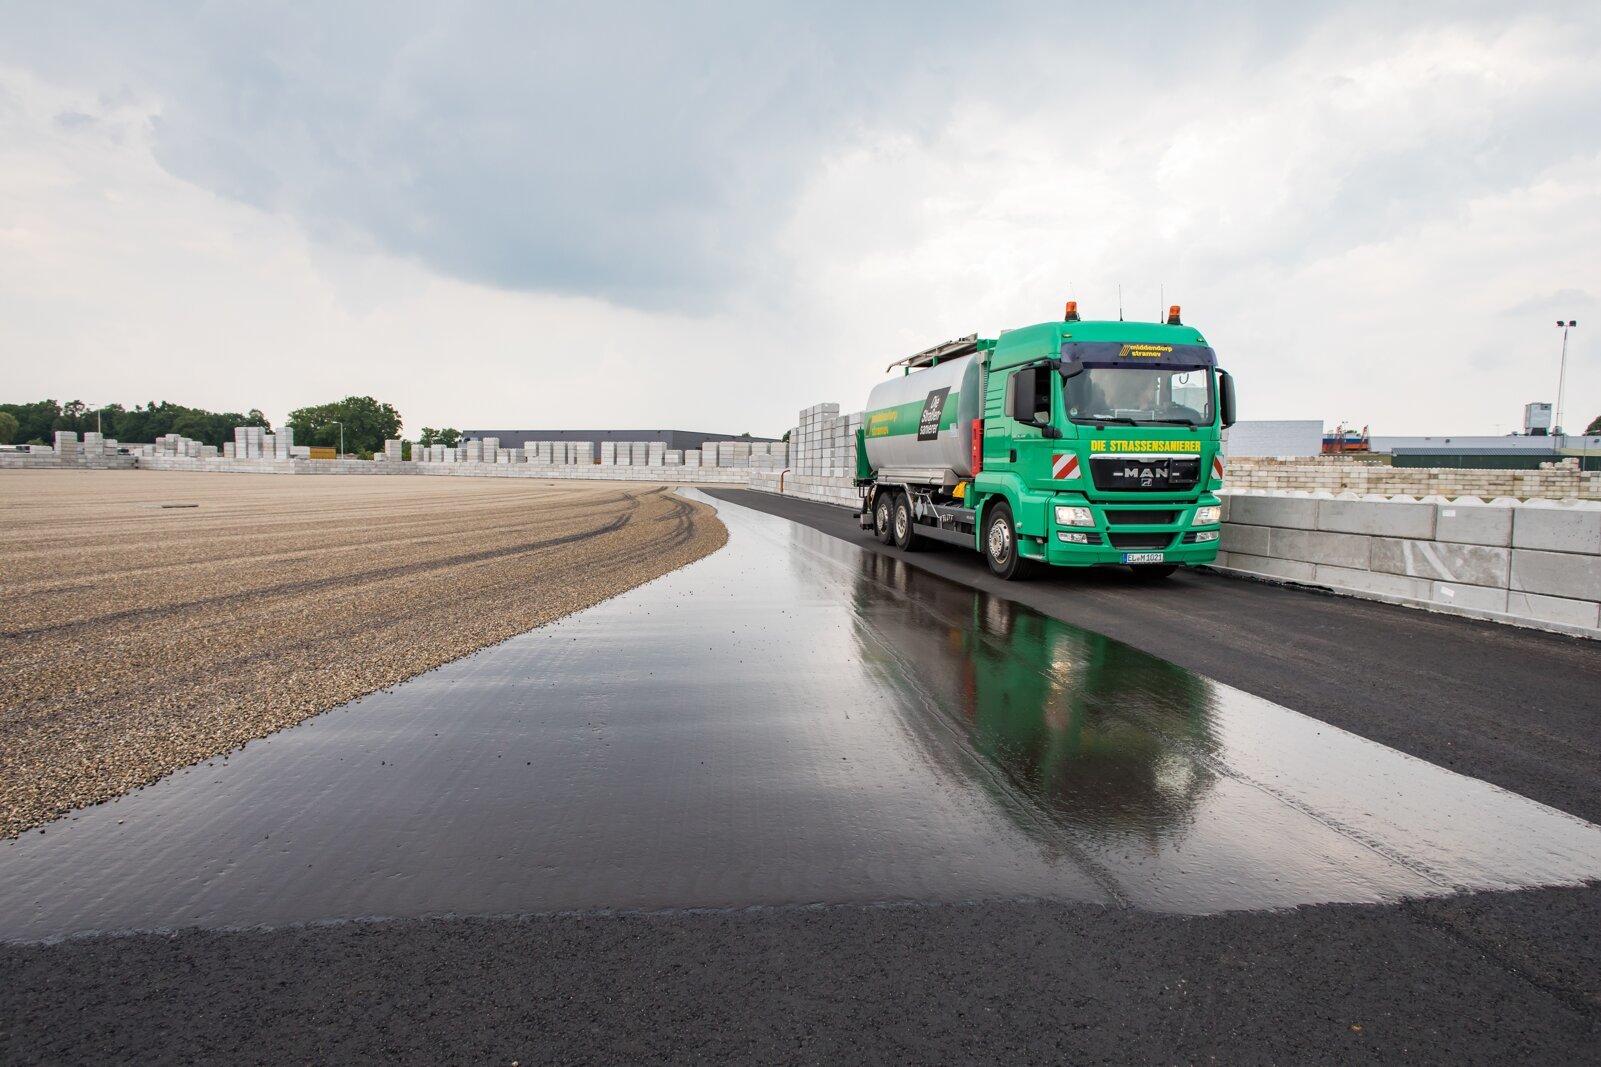 Vrachtwagen middendrop nat asfalt grind beton